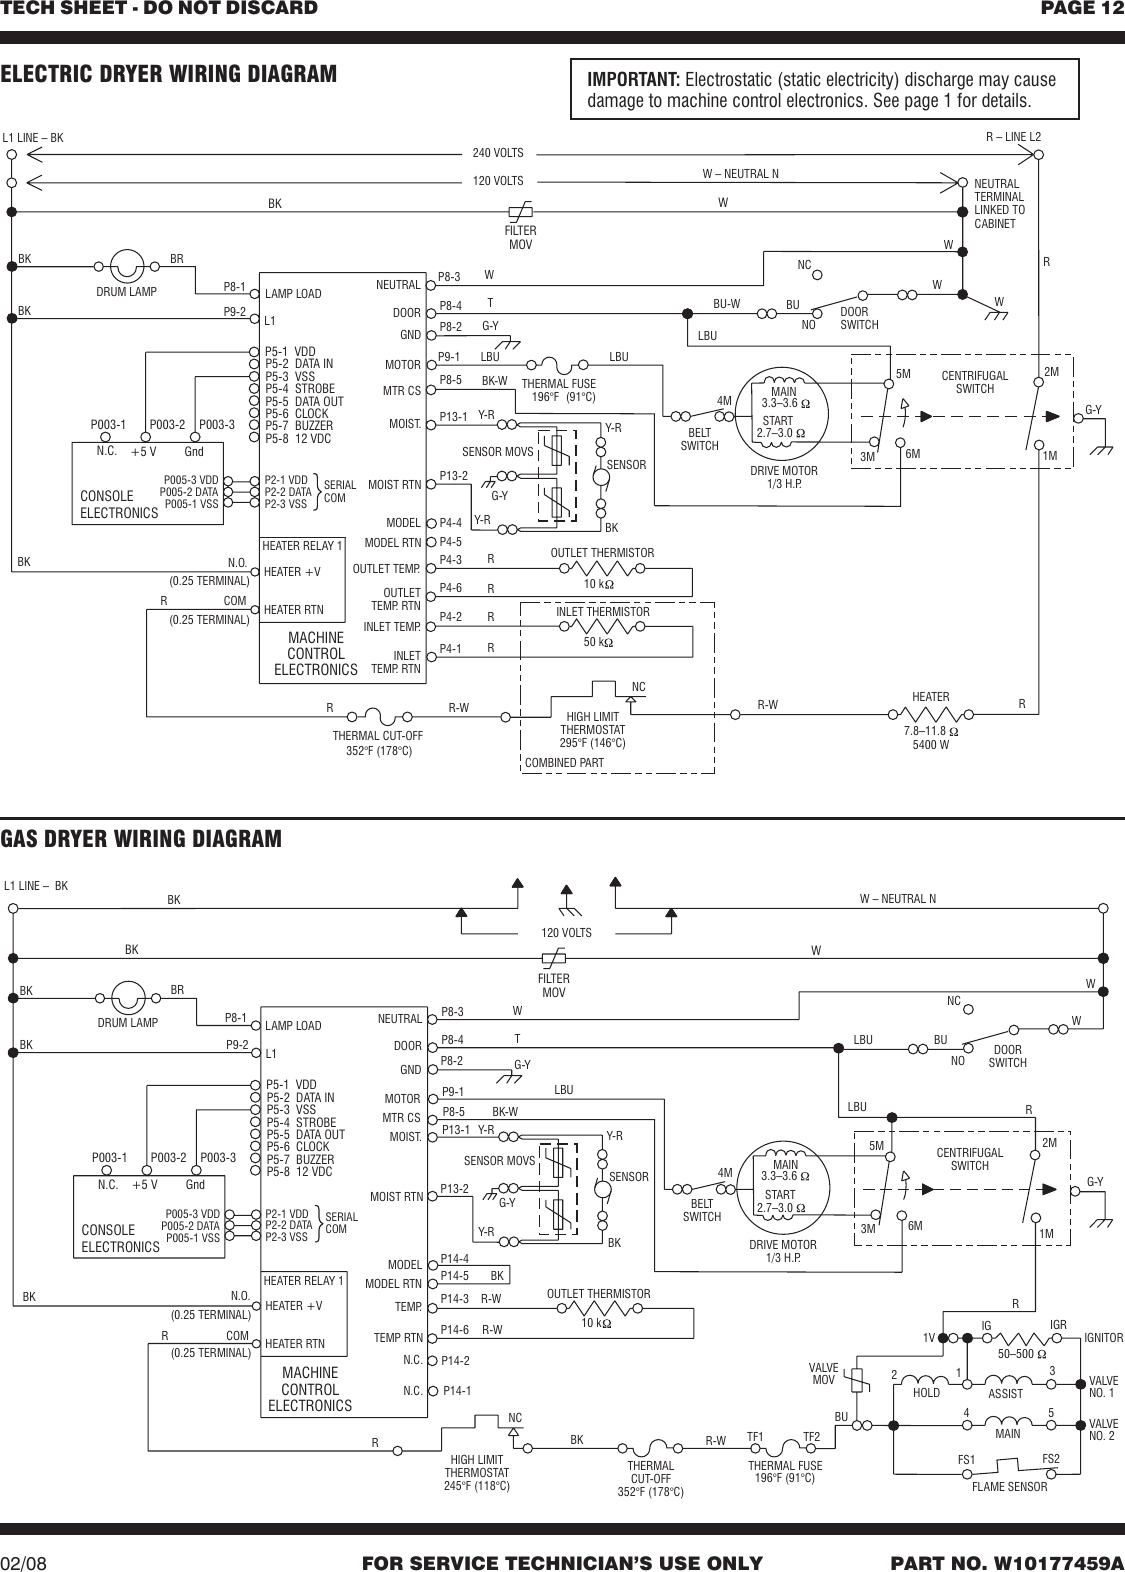 Zb80281 W10177459avp W10177459a Whirlpool Duet Sport Dryer Tech Sheet Wiring Diagram Page 12 Of